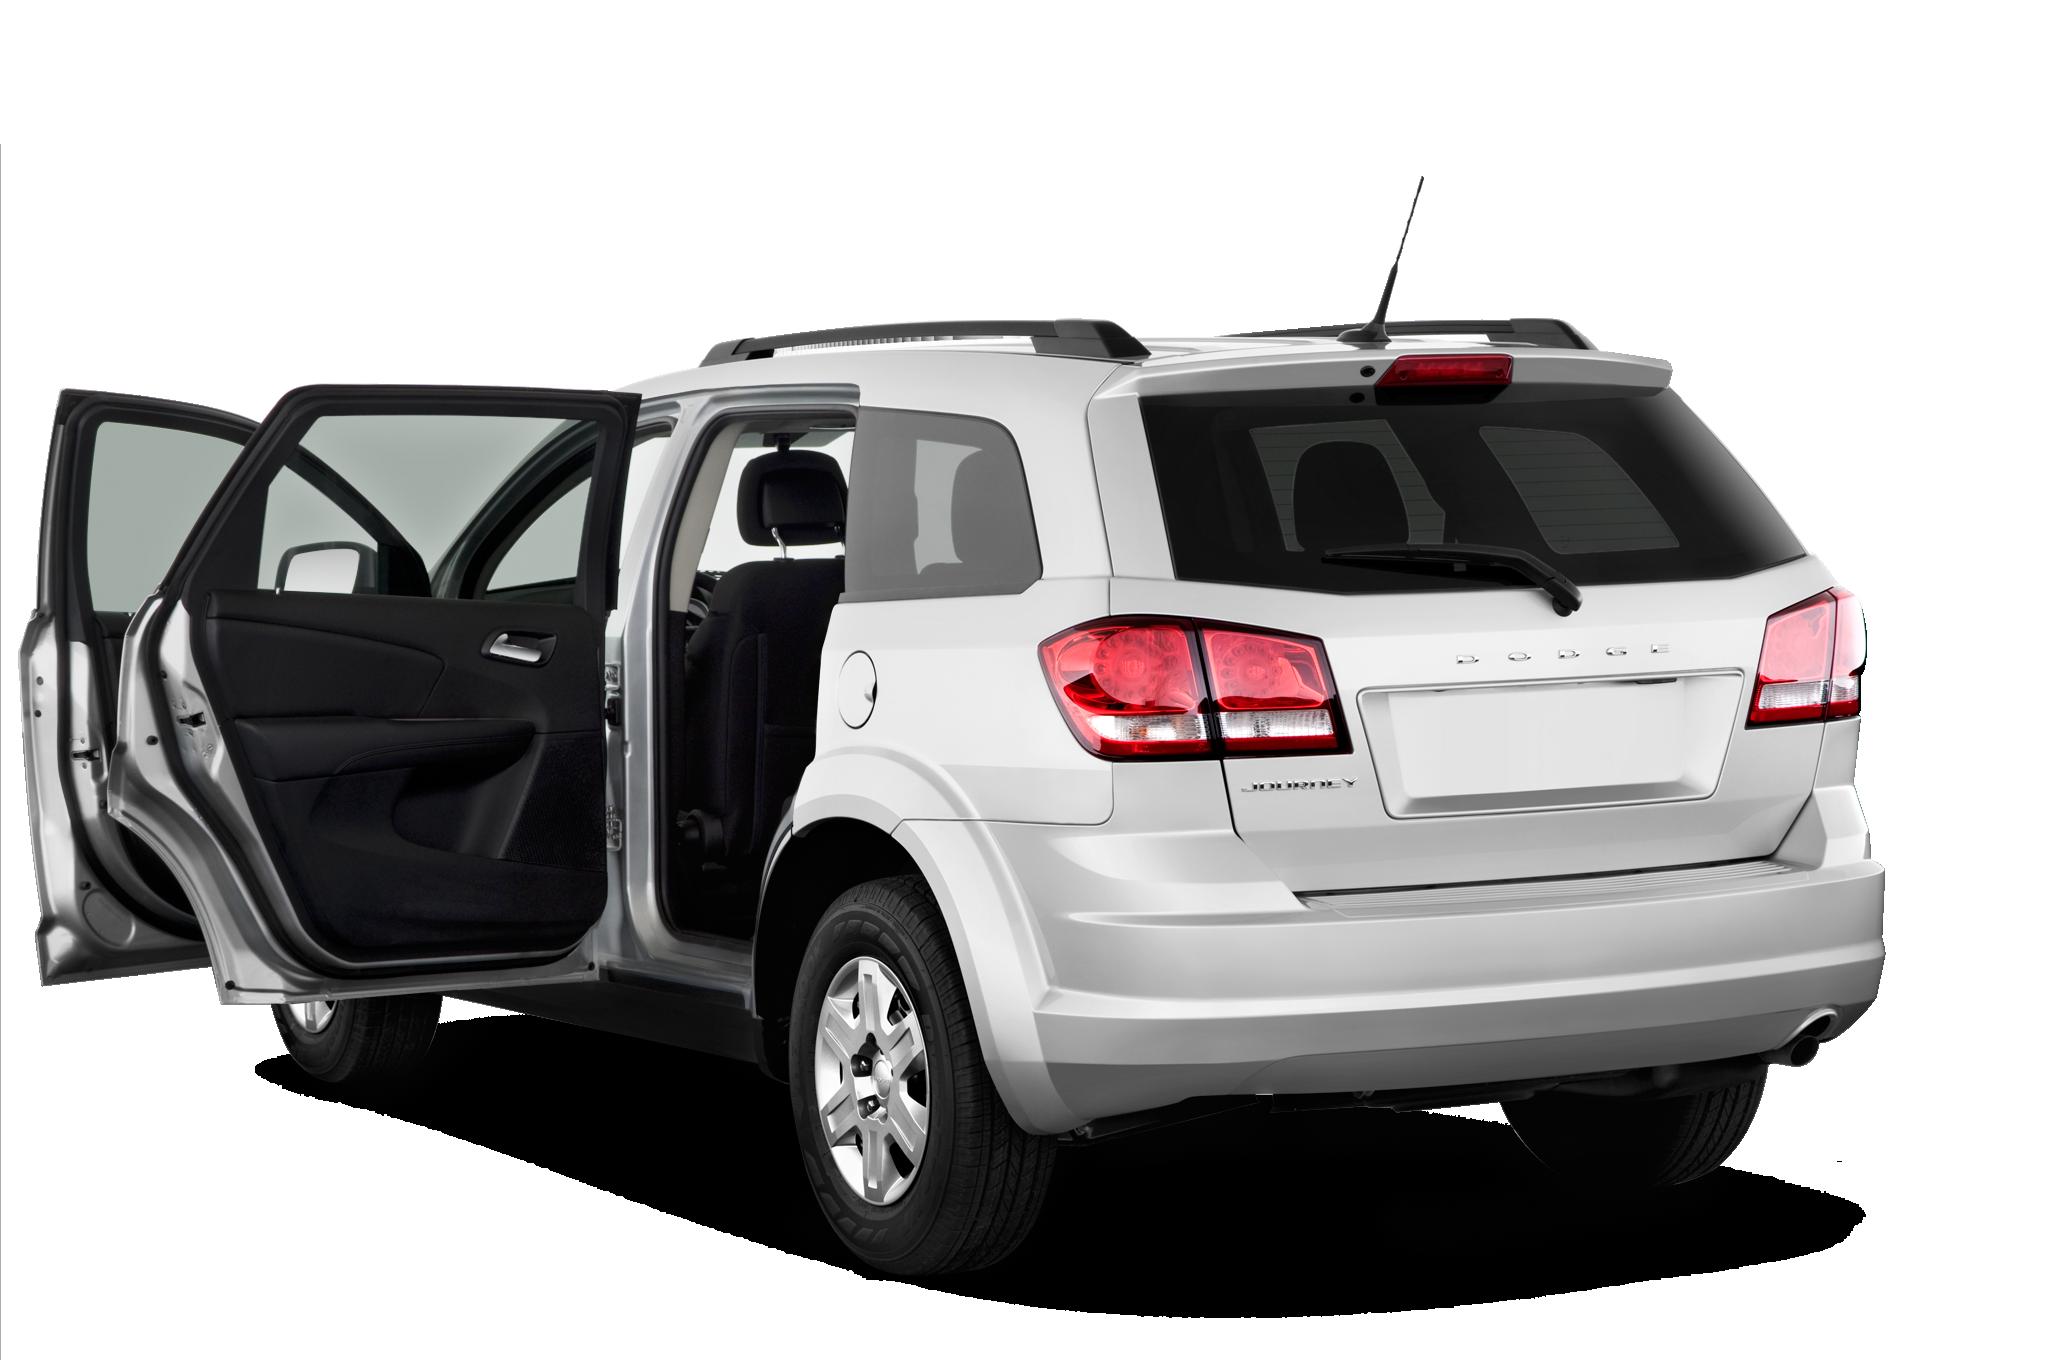 Dodge Journey Mpg >> Dodge Journey Mpg Top New Car Release Date